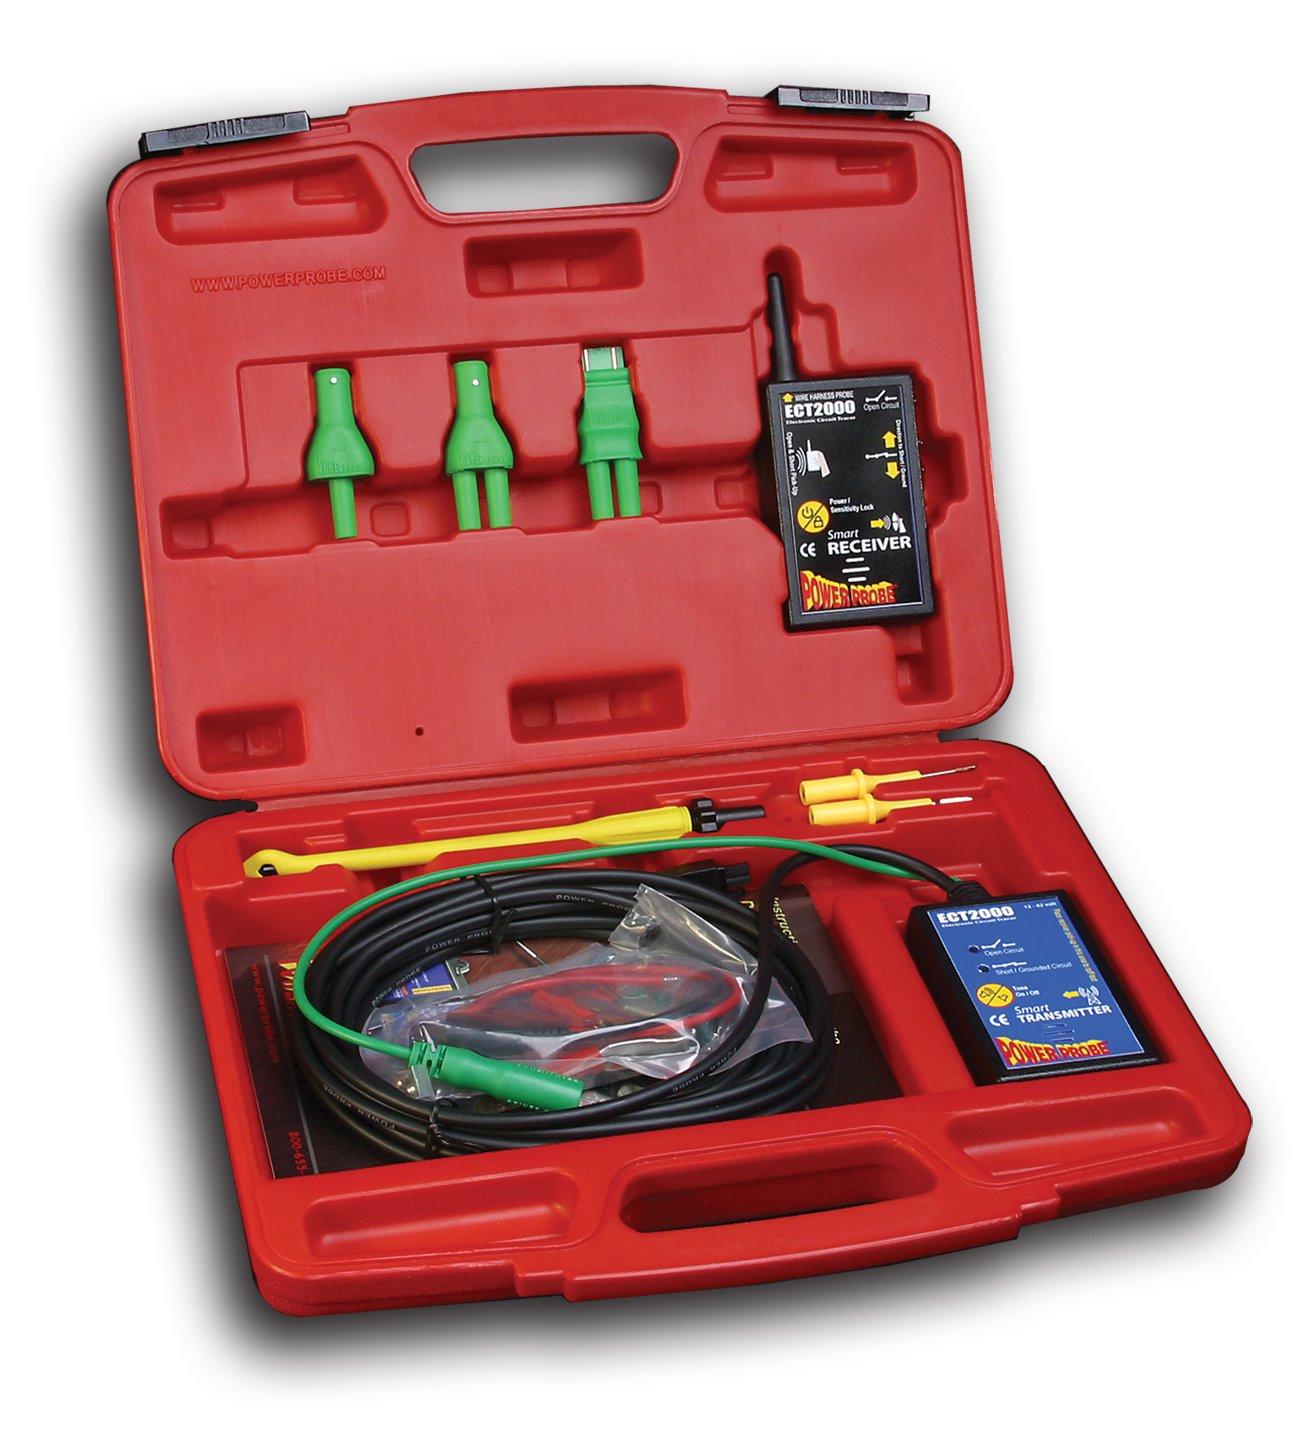 Power Probe Ect2000 Short Open Circuit Detector Automotive Cable Wire Tracker Openshort Digital Repair Tester Allsun